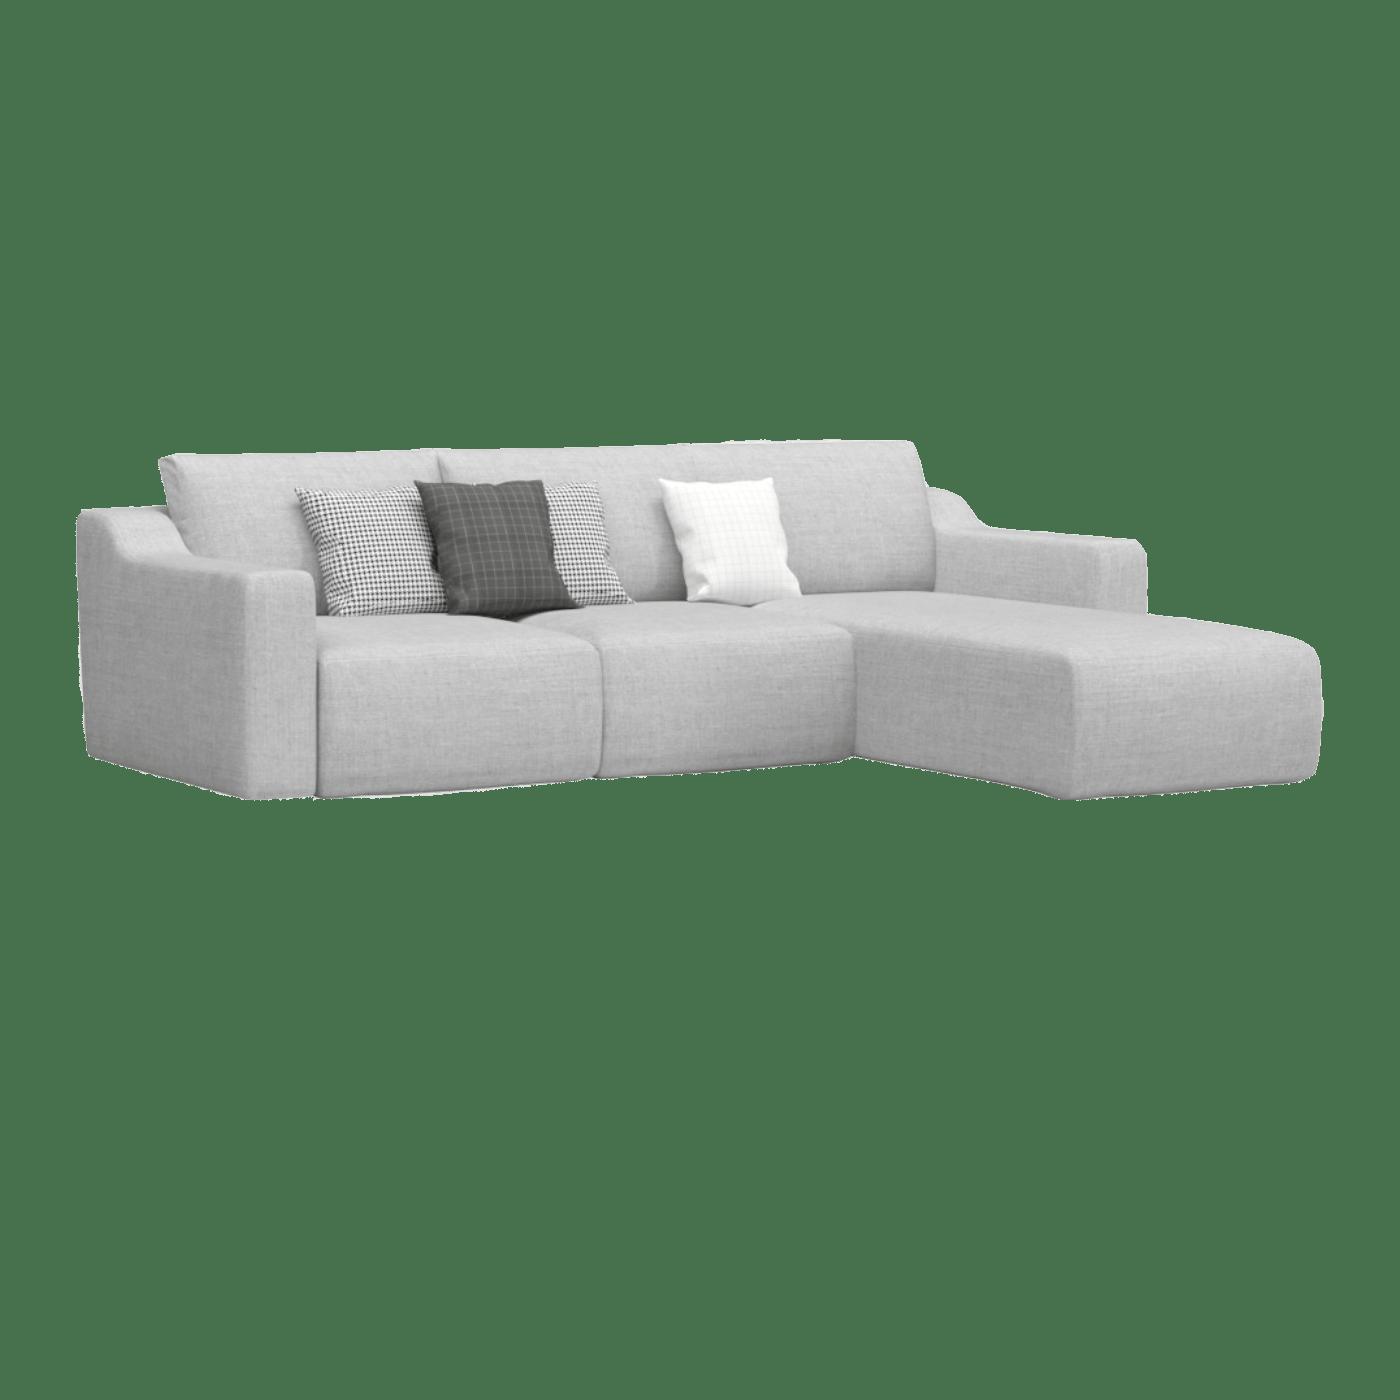 Ellender 2 seater sofa + Chaise